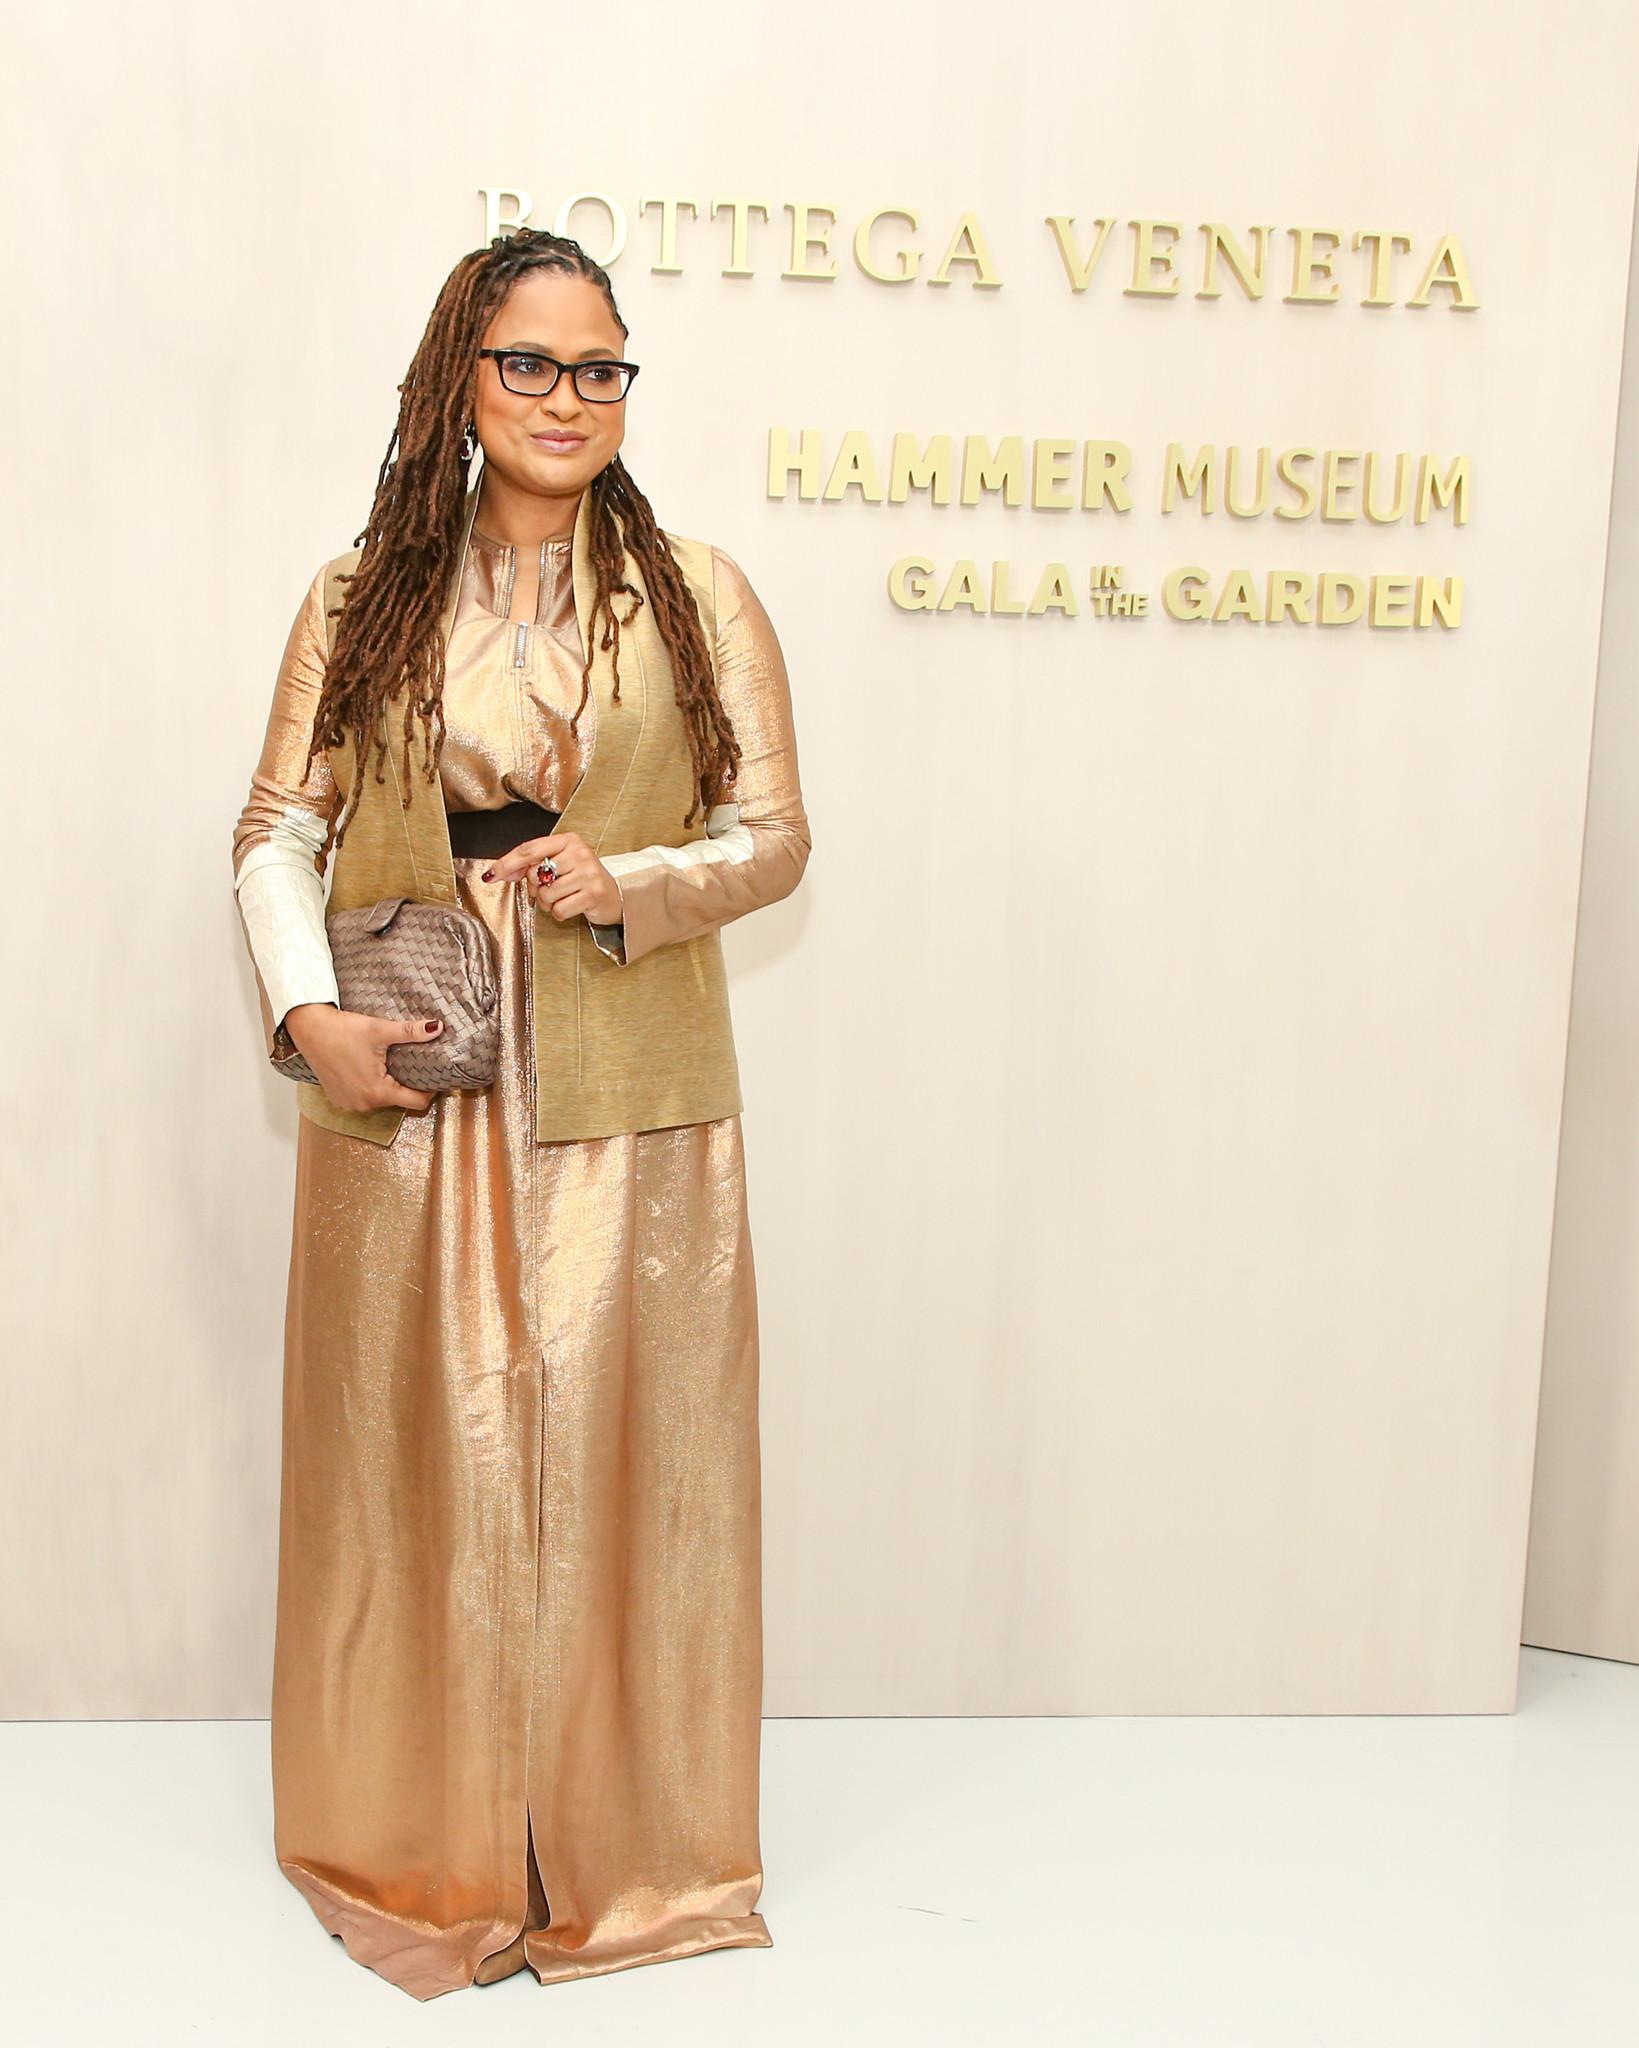 Honoree Ava DuVernay on Saturday at the Hammer Museum gala, which was sponsored by Italian fashion label Bottega Veneta.